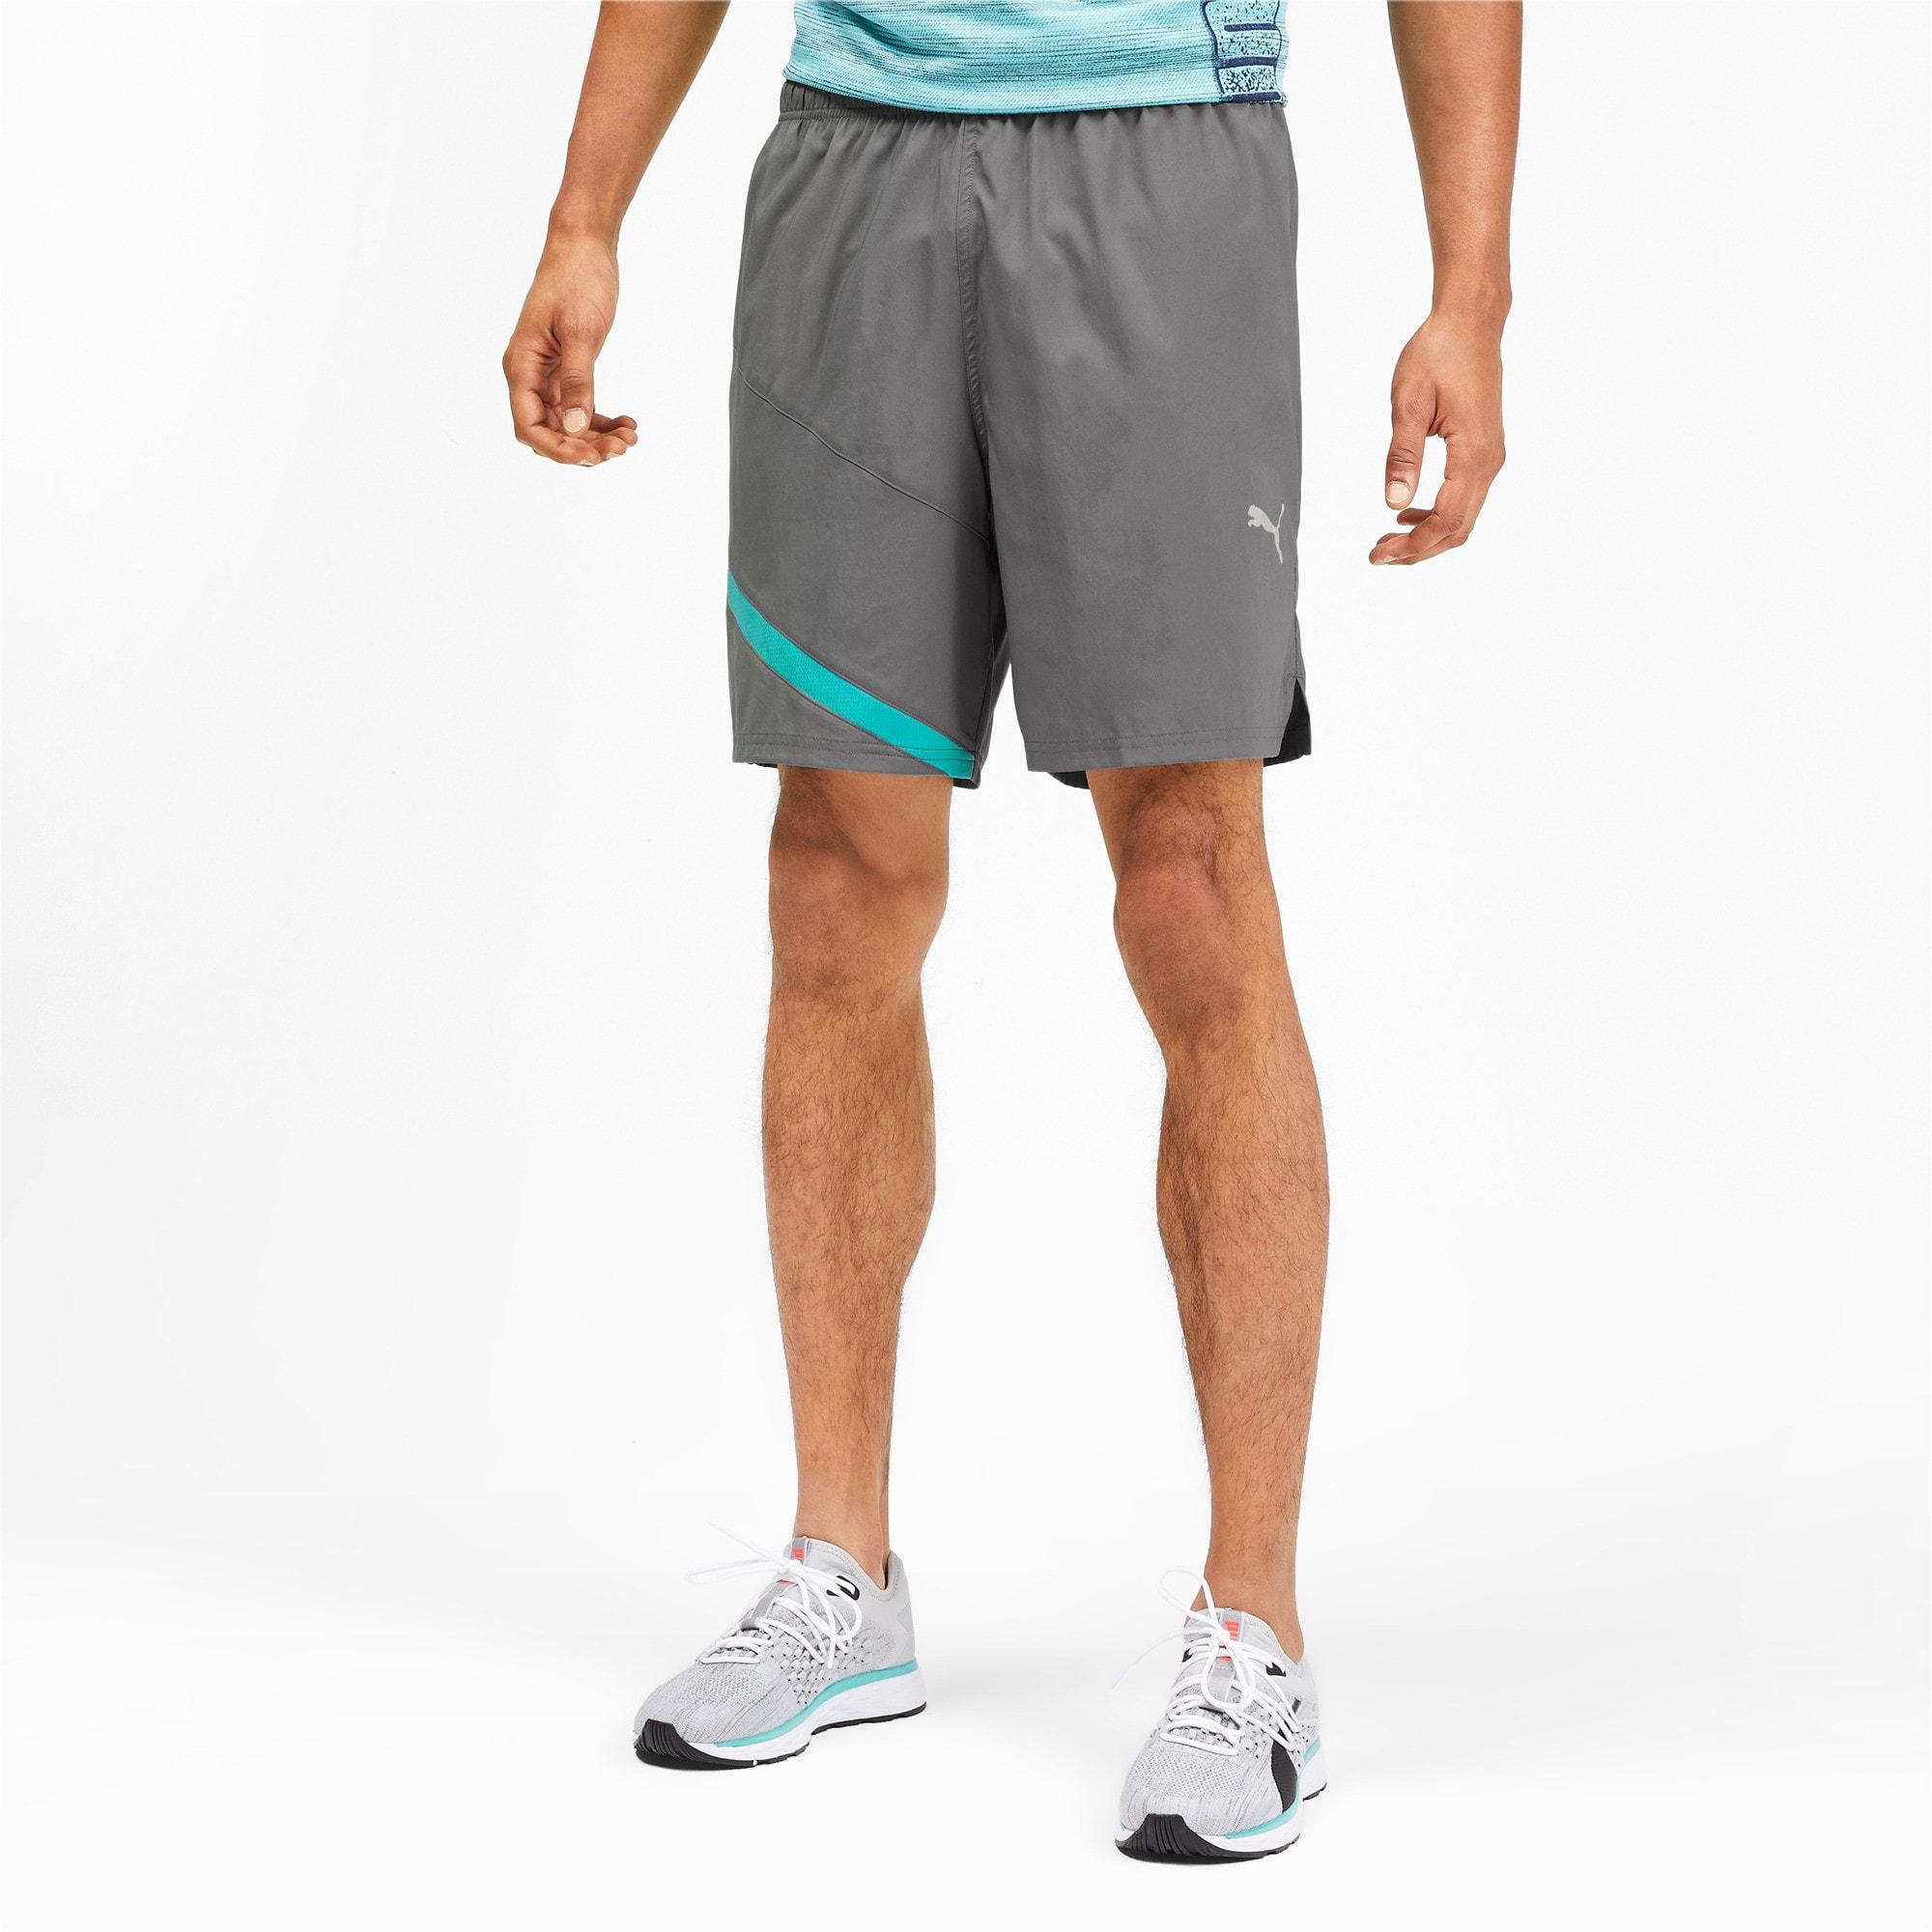 "Miniatura 1 de Shorts Ignite Blocked de 7"" para hombre, CASTLEROCK-Blue Turquoise, mediano"